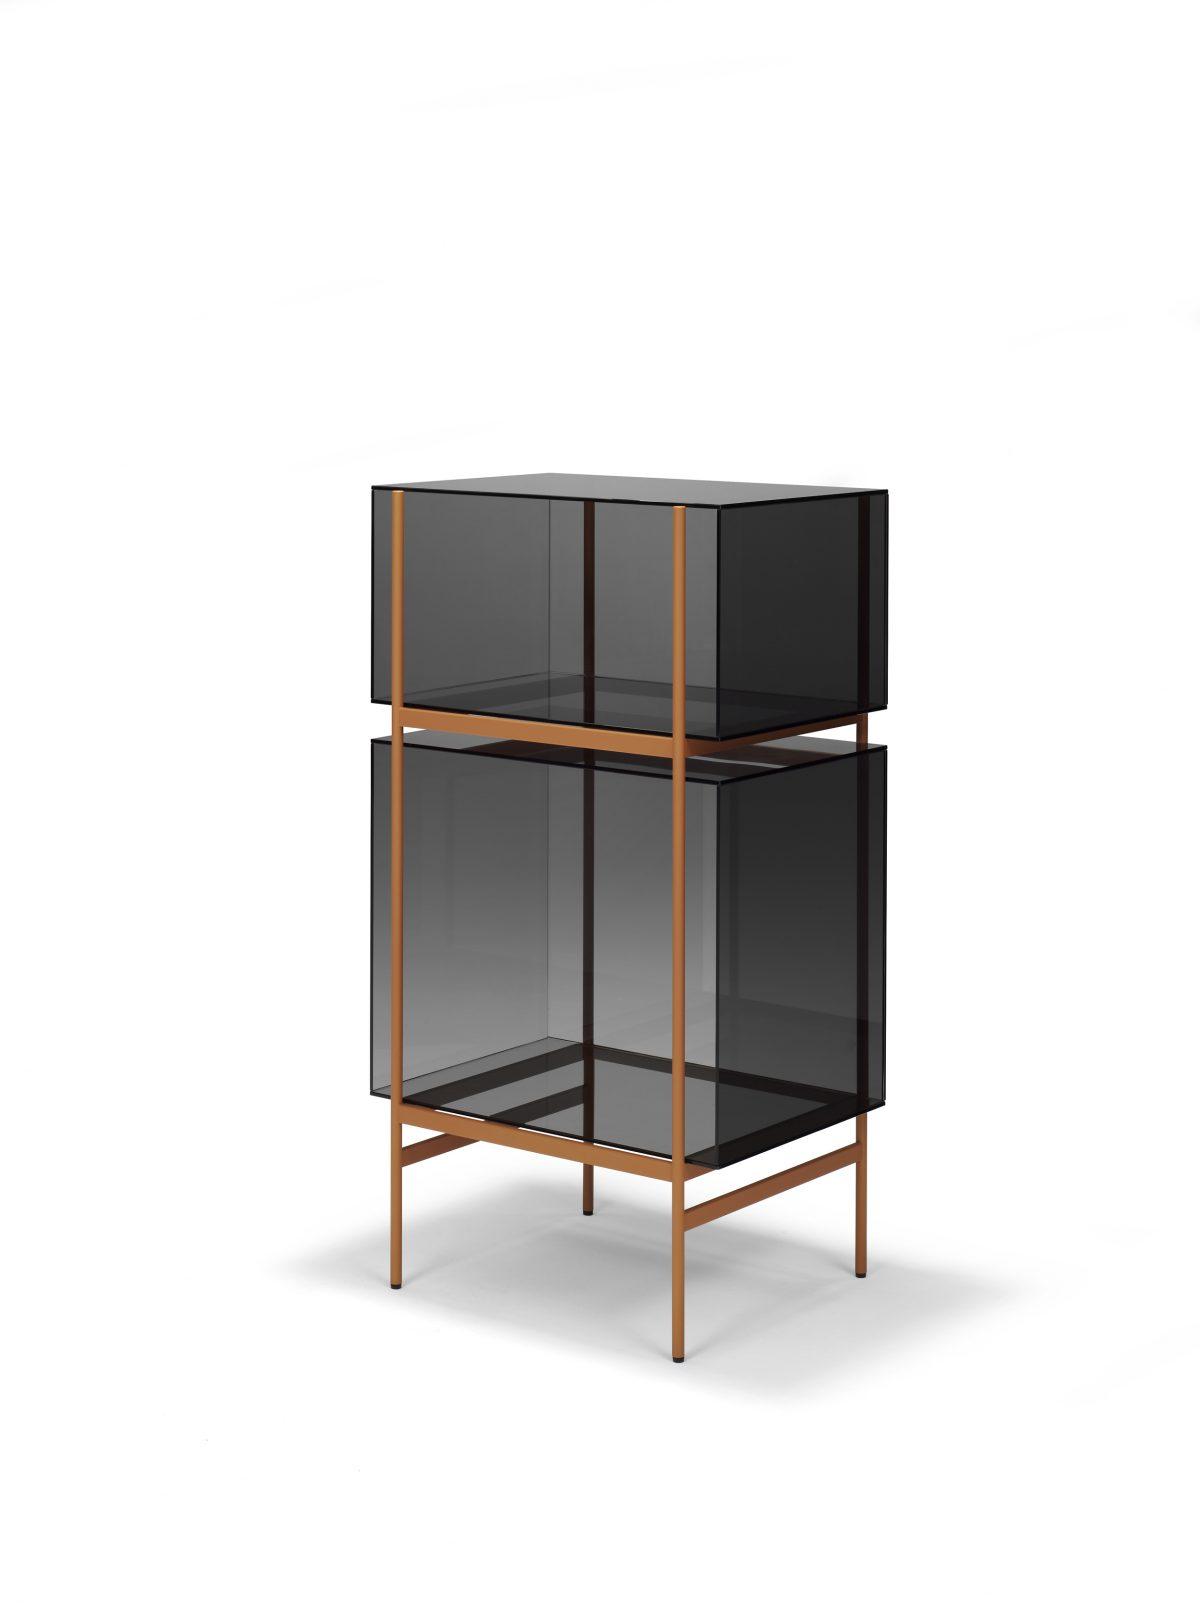 Kast LYN 2 Vakken Visser Meijwaard Exclusief Dutchdesign Oranje Frame Grijs Glas JOSHH& 22